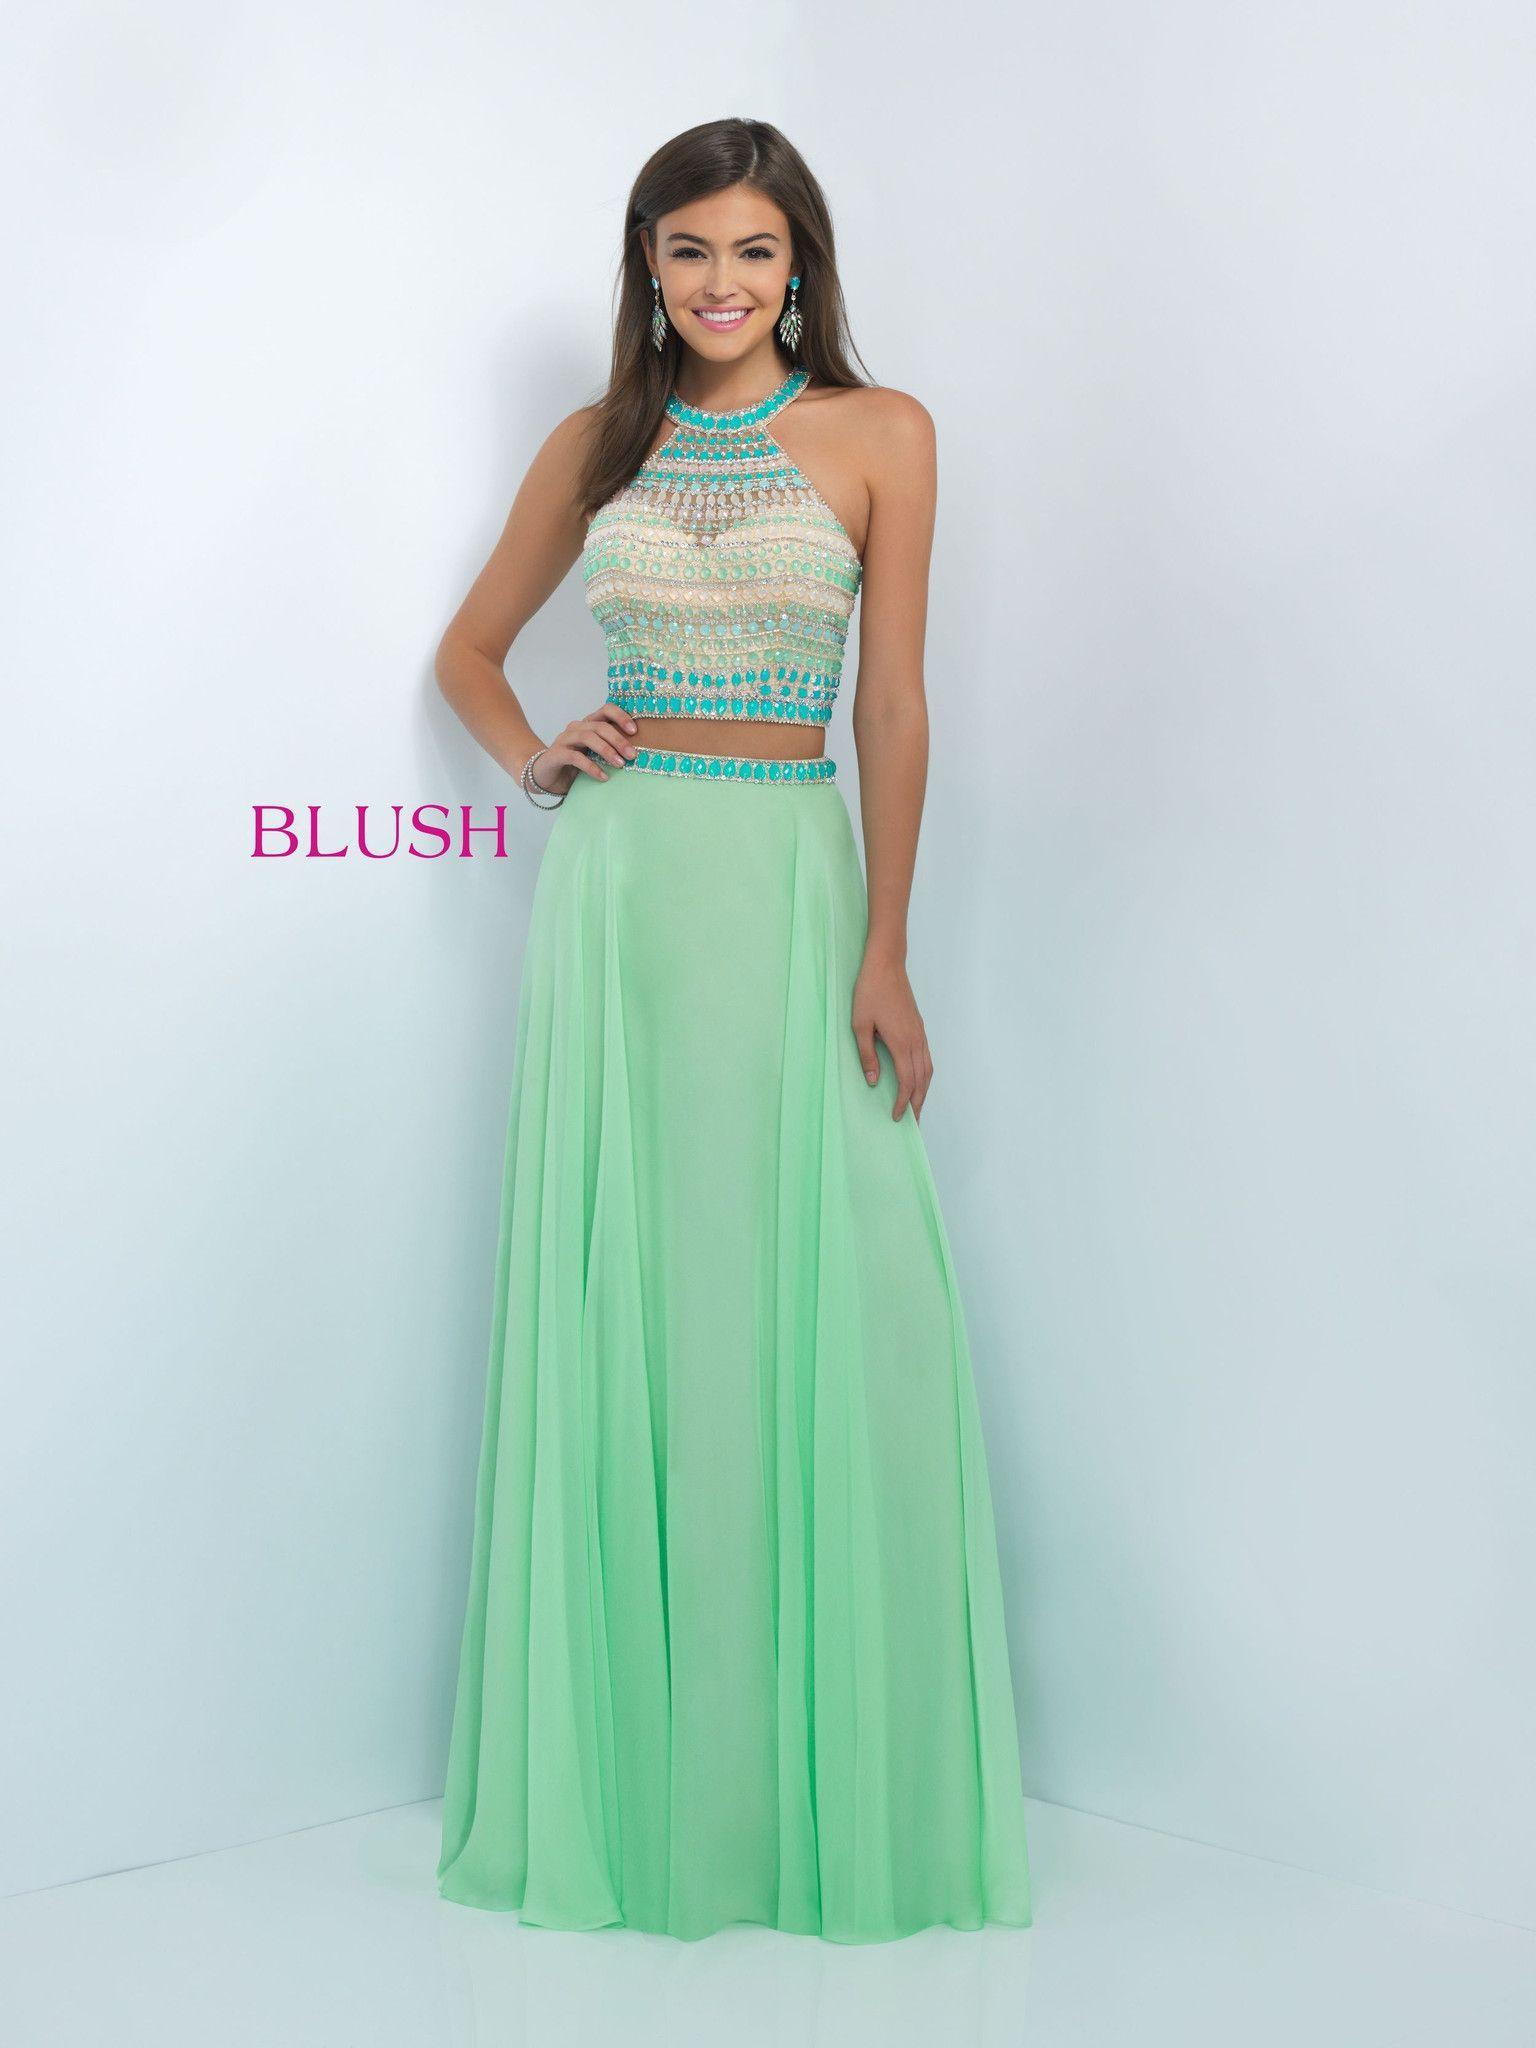 Blush Prom 11056 Honeydew   prom   Prom dresses,